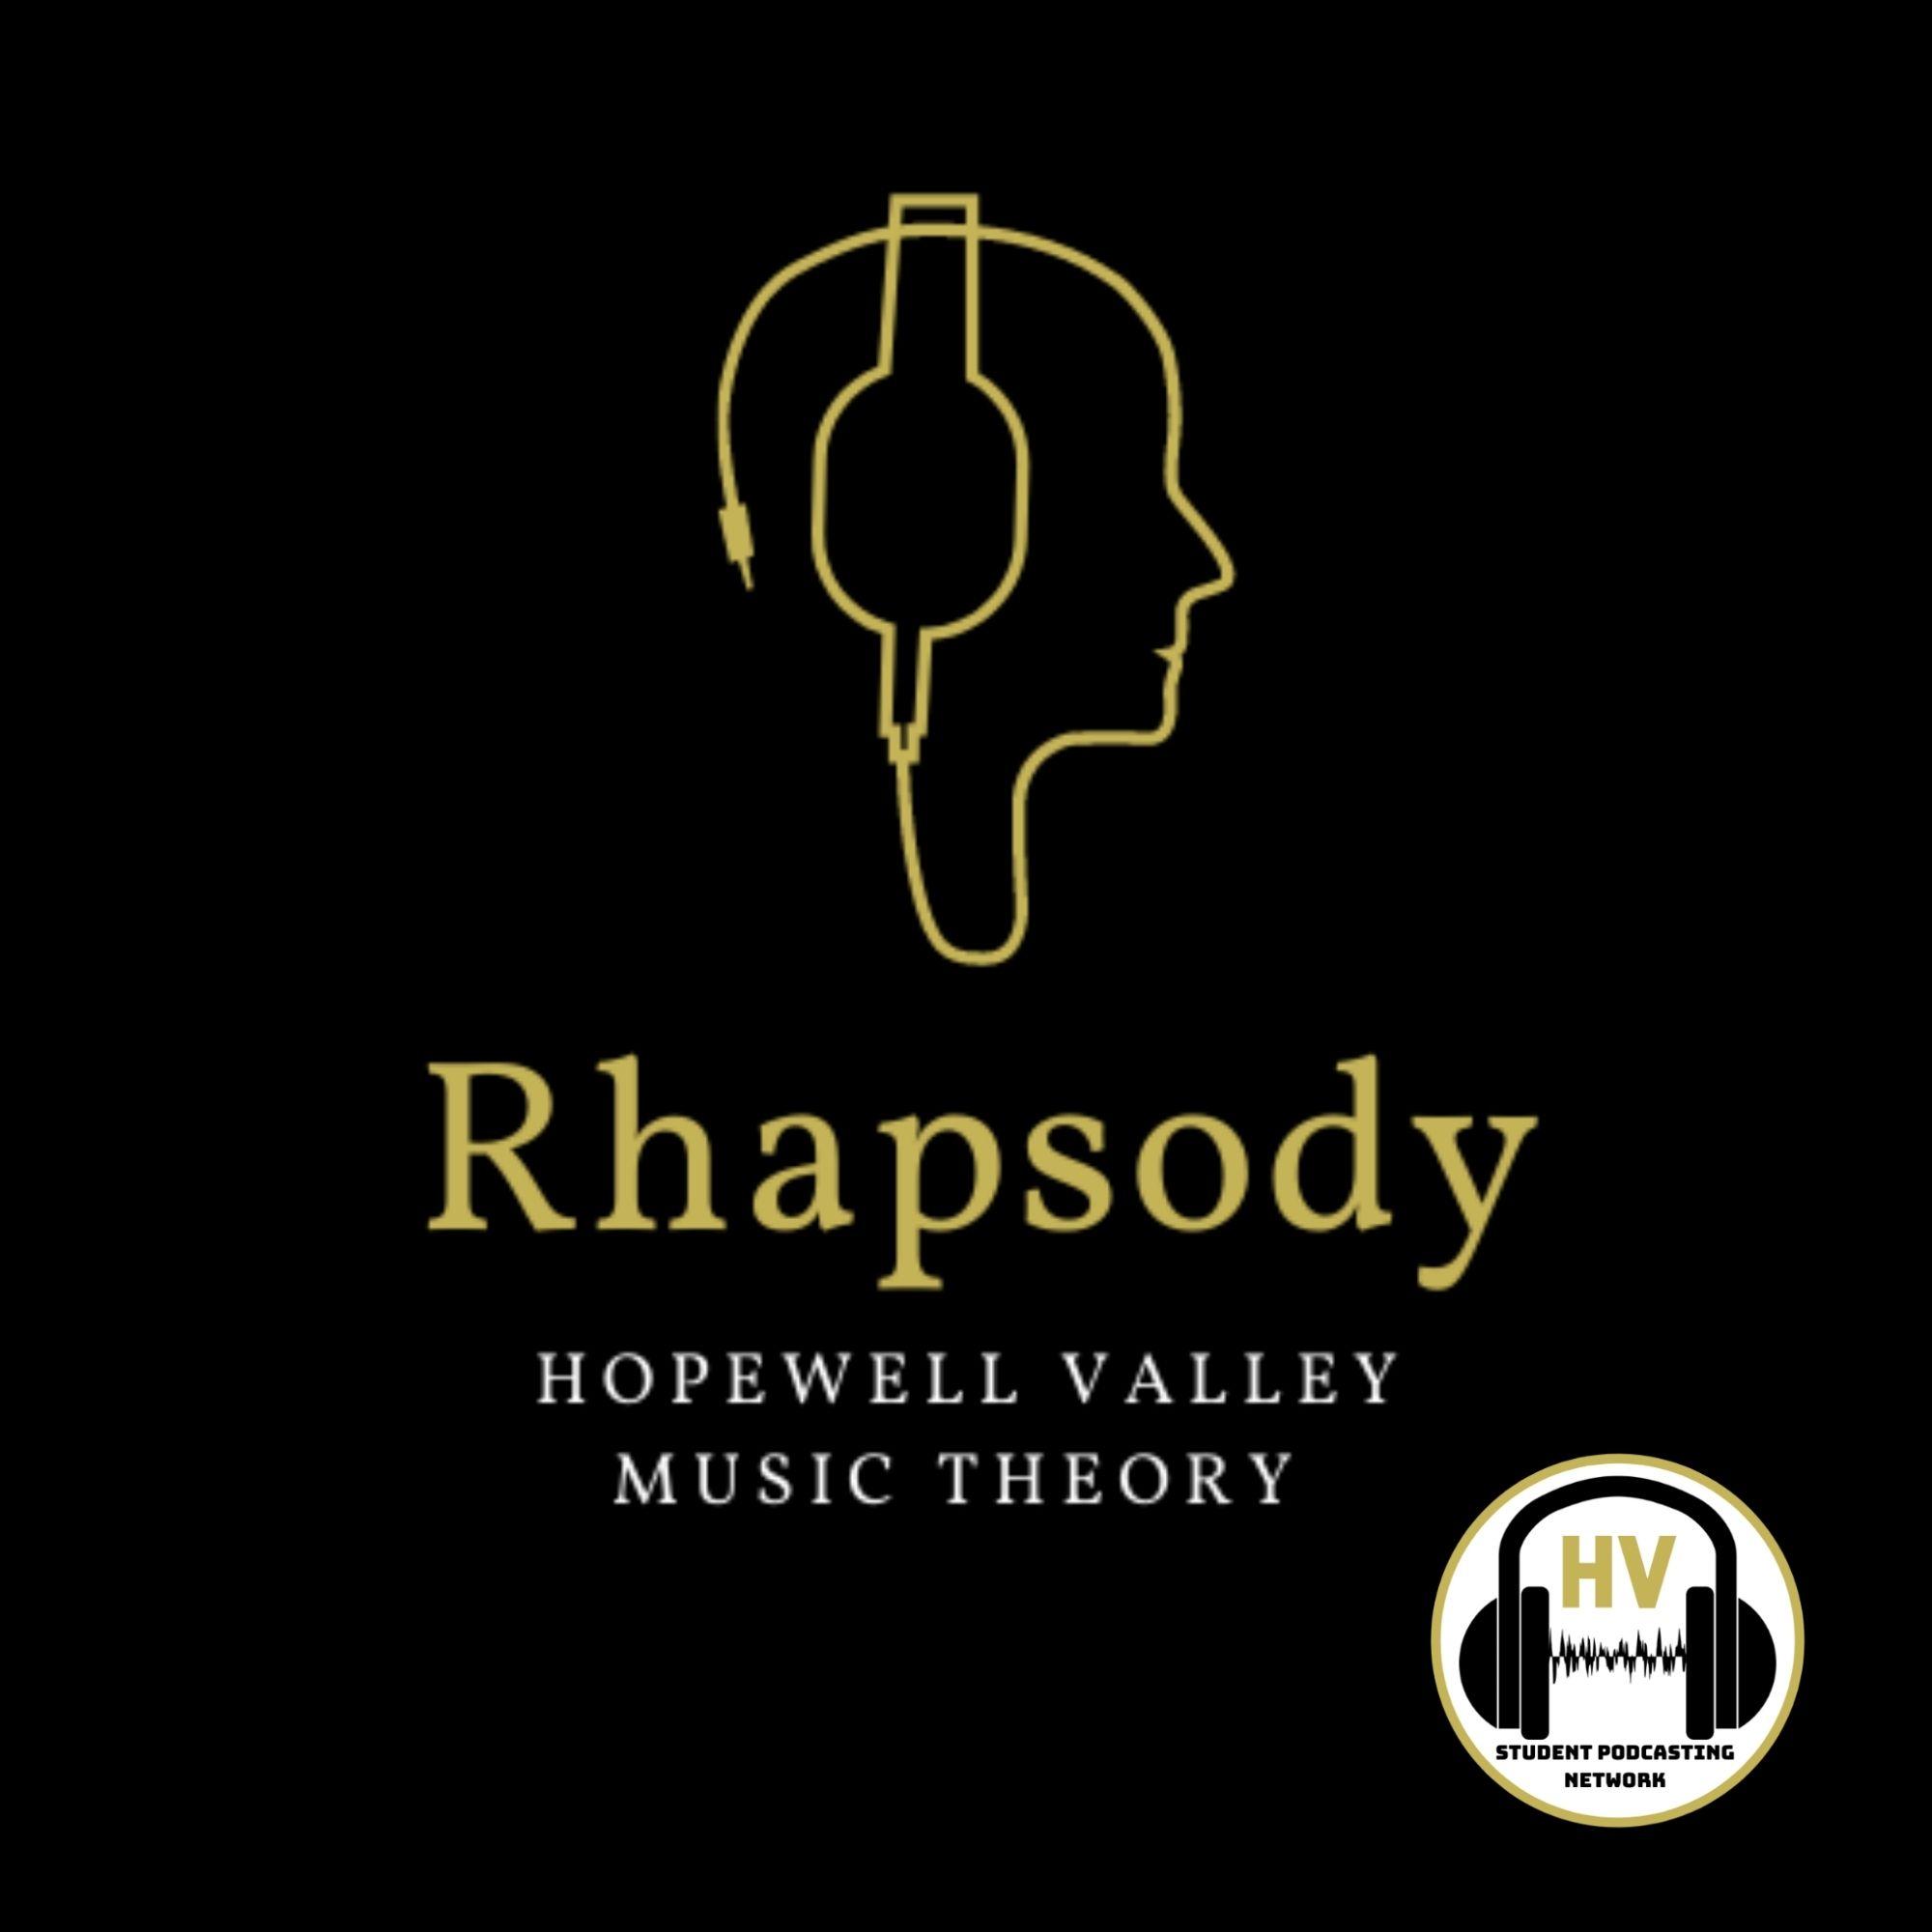 Artwork for podcast Rhapsody